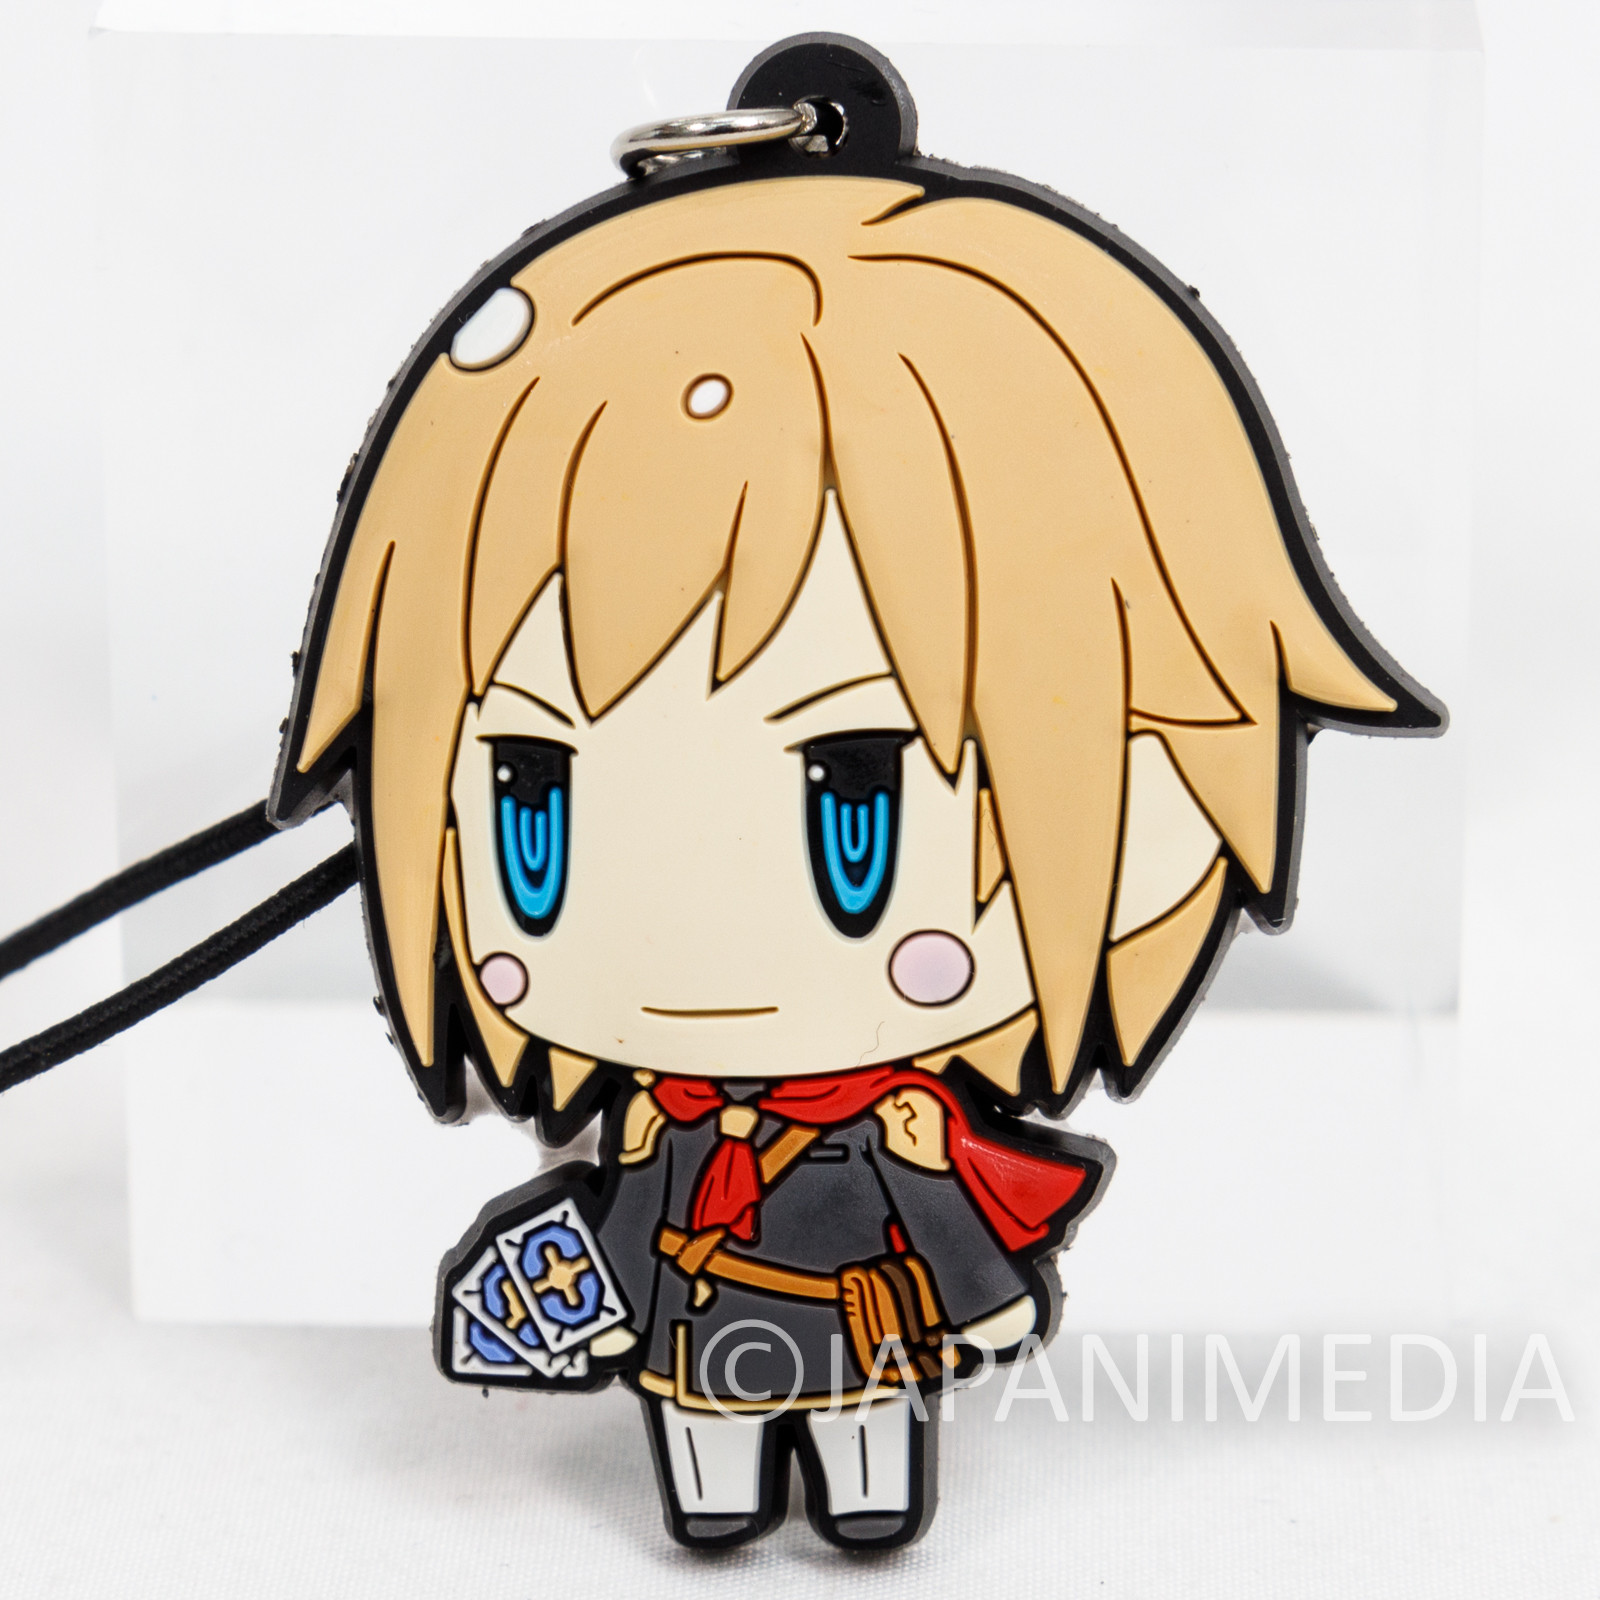 Final Fantasy Ace Mascot Rubber Strap JAPAN SQUARE ENIX